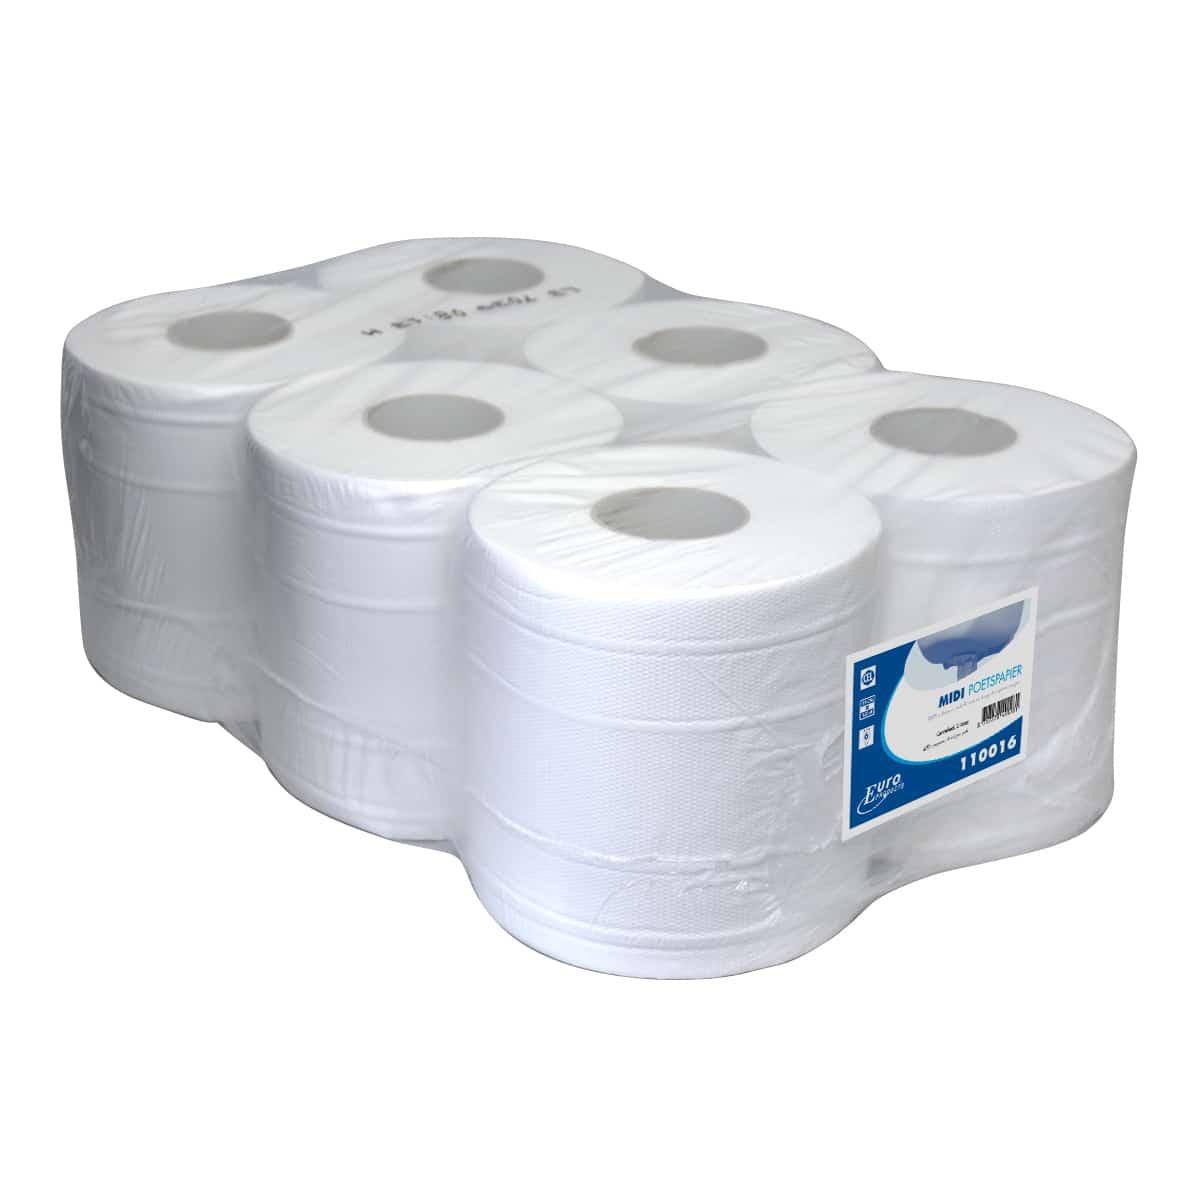 Midi poetspapier cellulose 1-laags (6 rol)